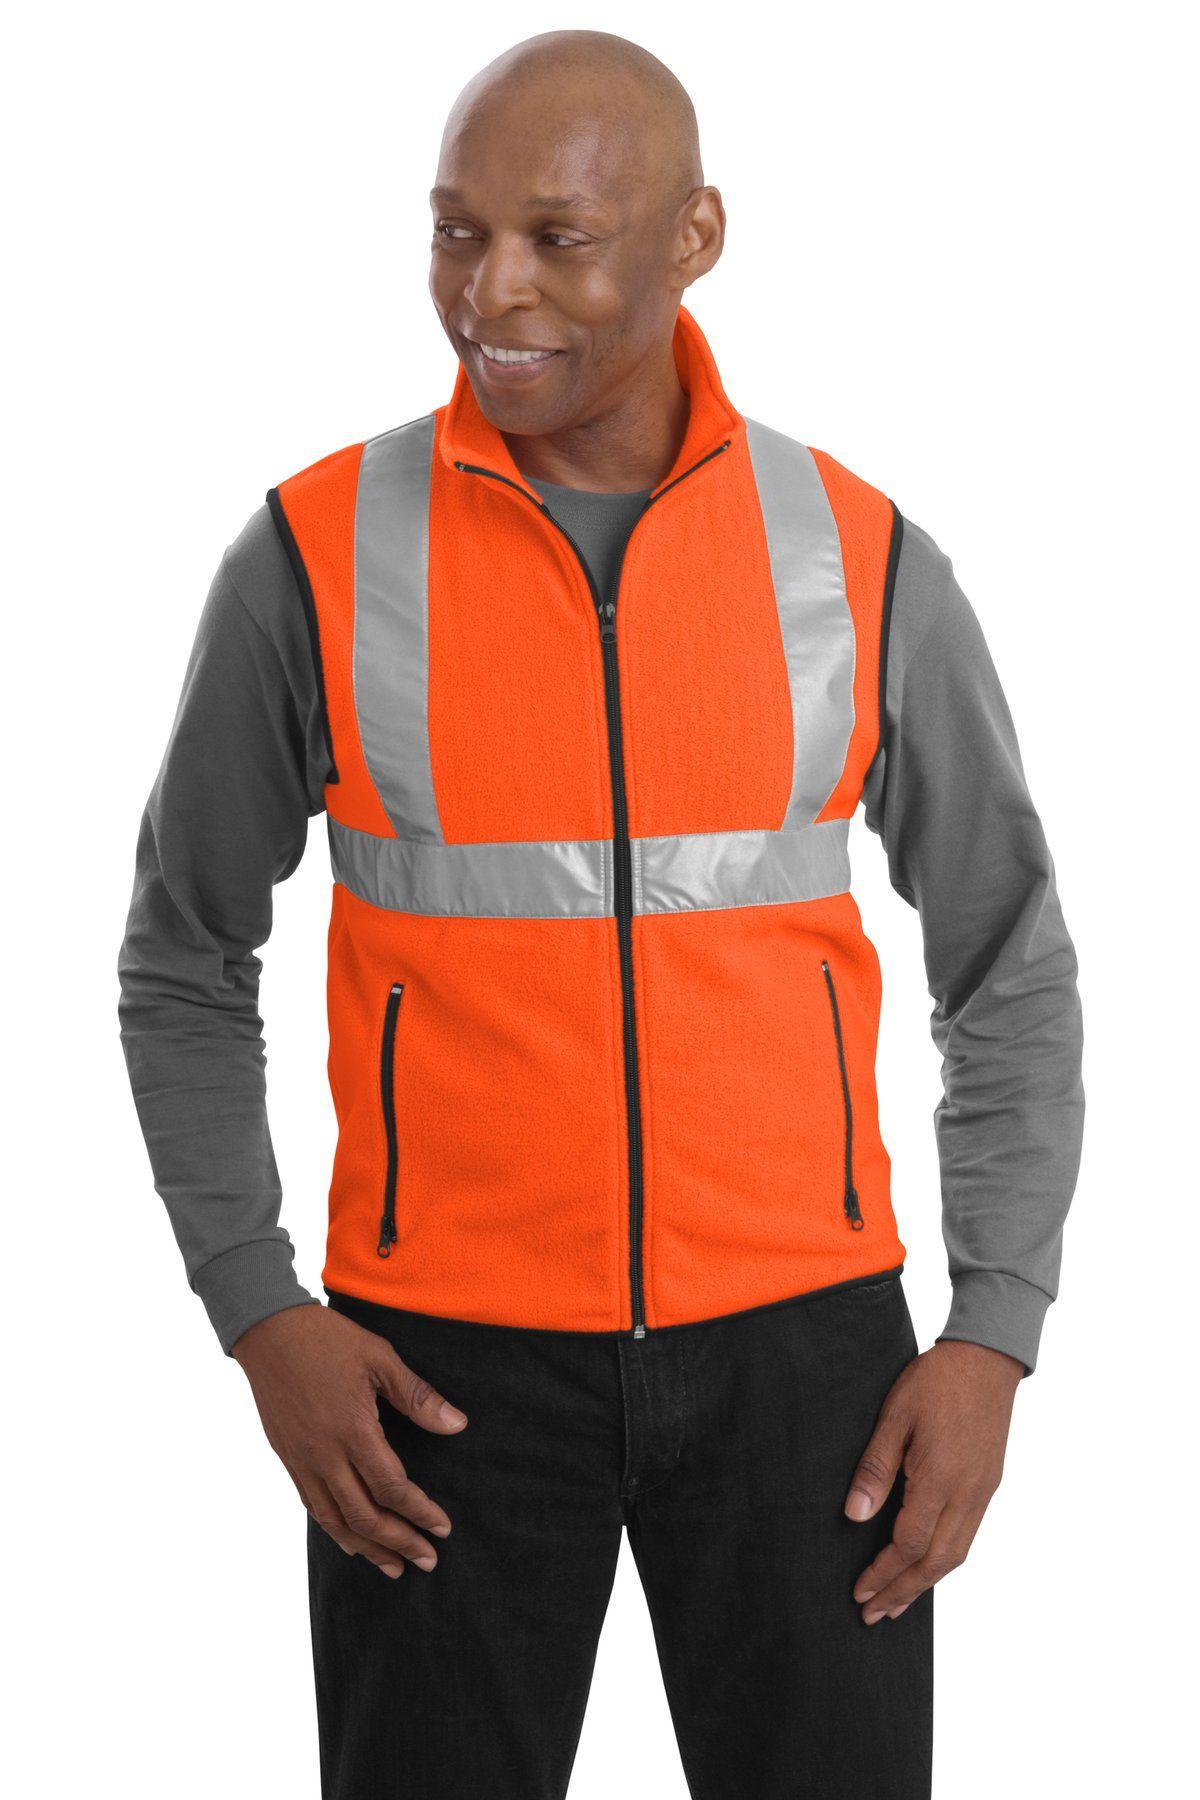 Fleece Fluorescent Reflective Vests. 9.98 on closeout